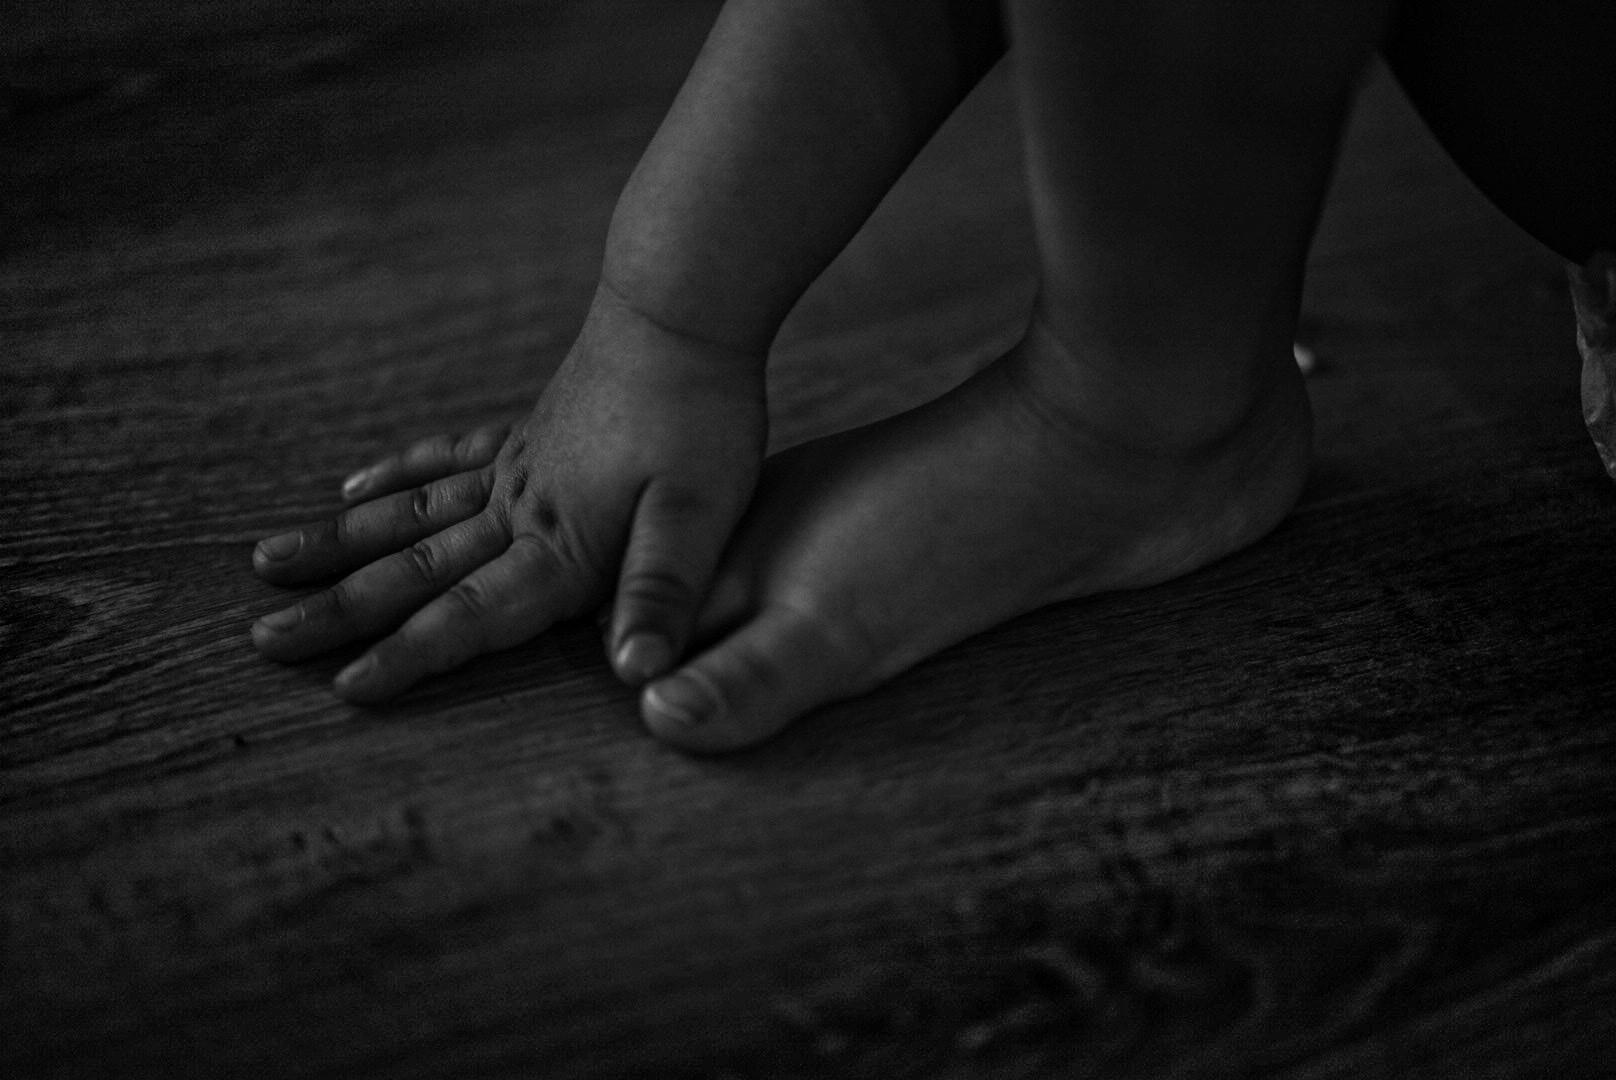 hand & foot .jpeg